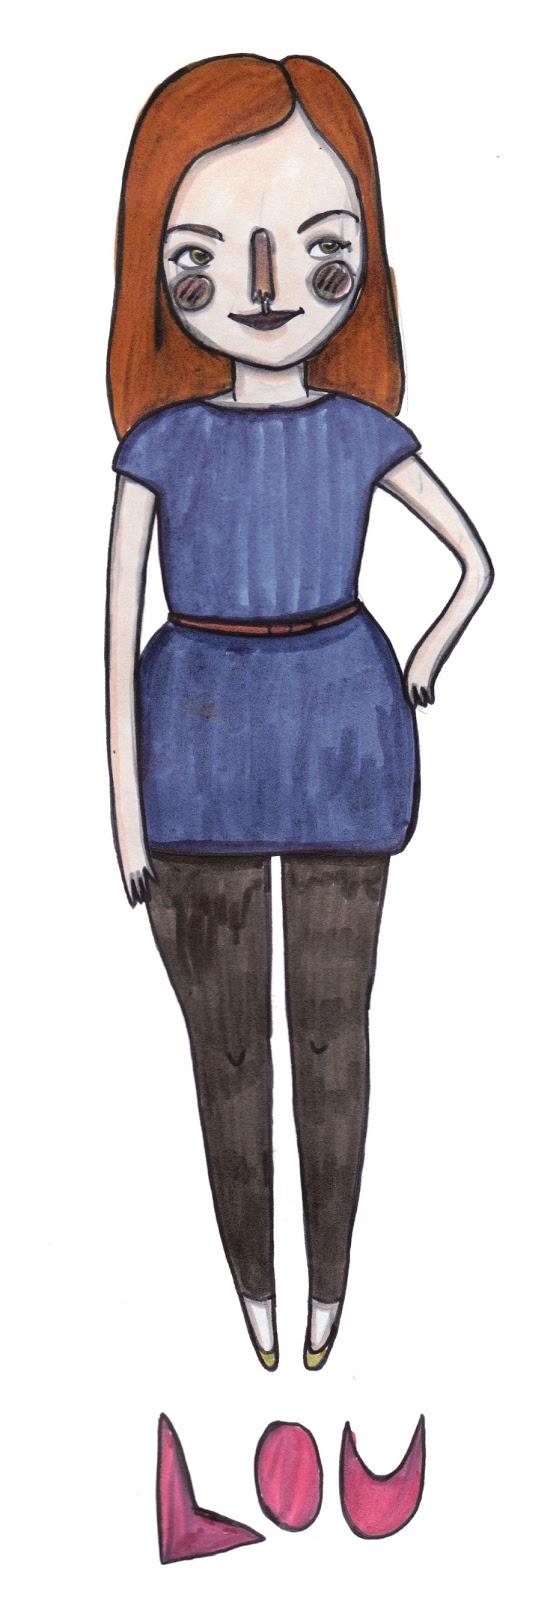 Gemma Flack illustration